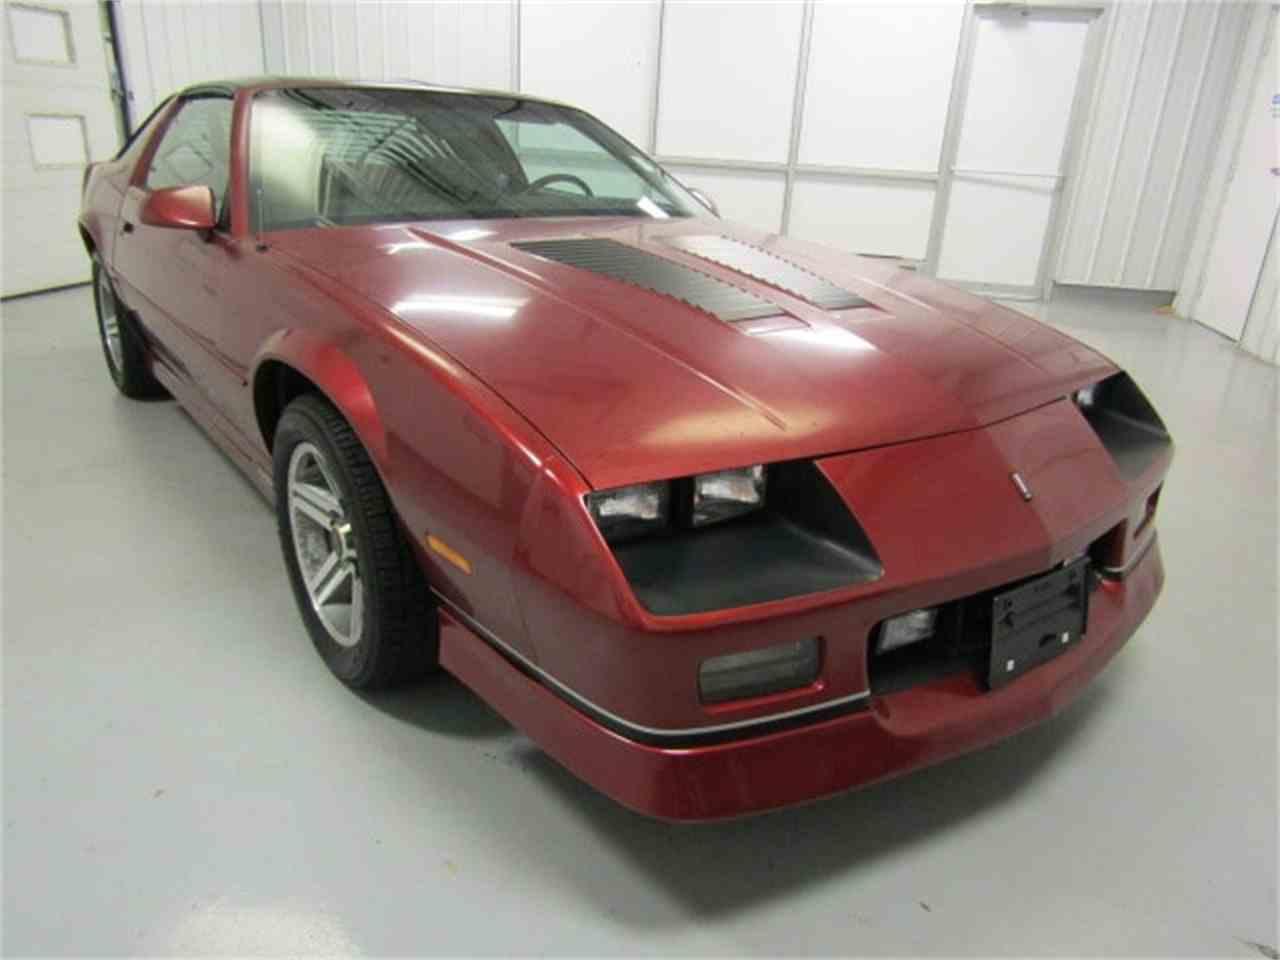 Large Picture of '86 Camaro - $24,900.00 - JLAE